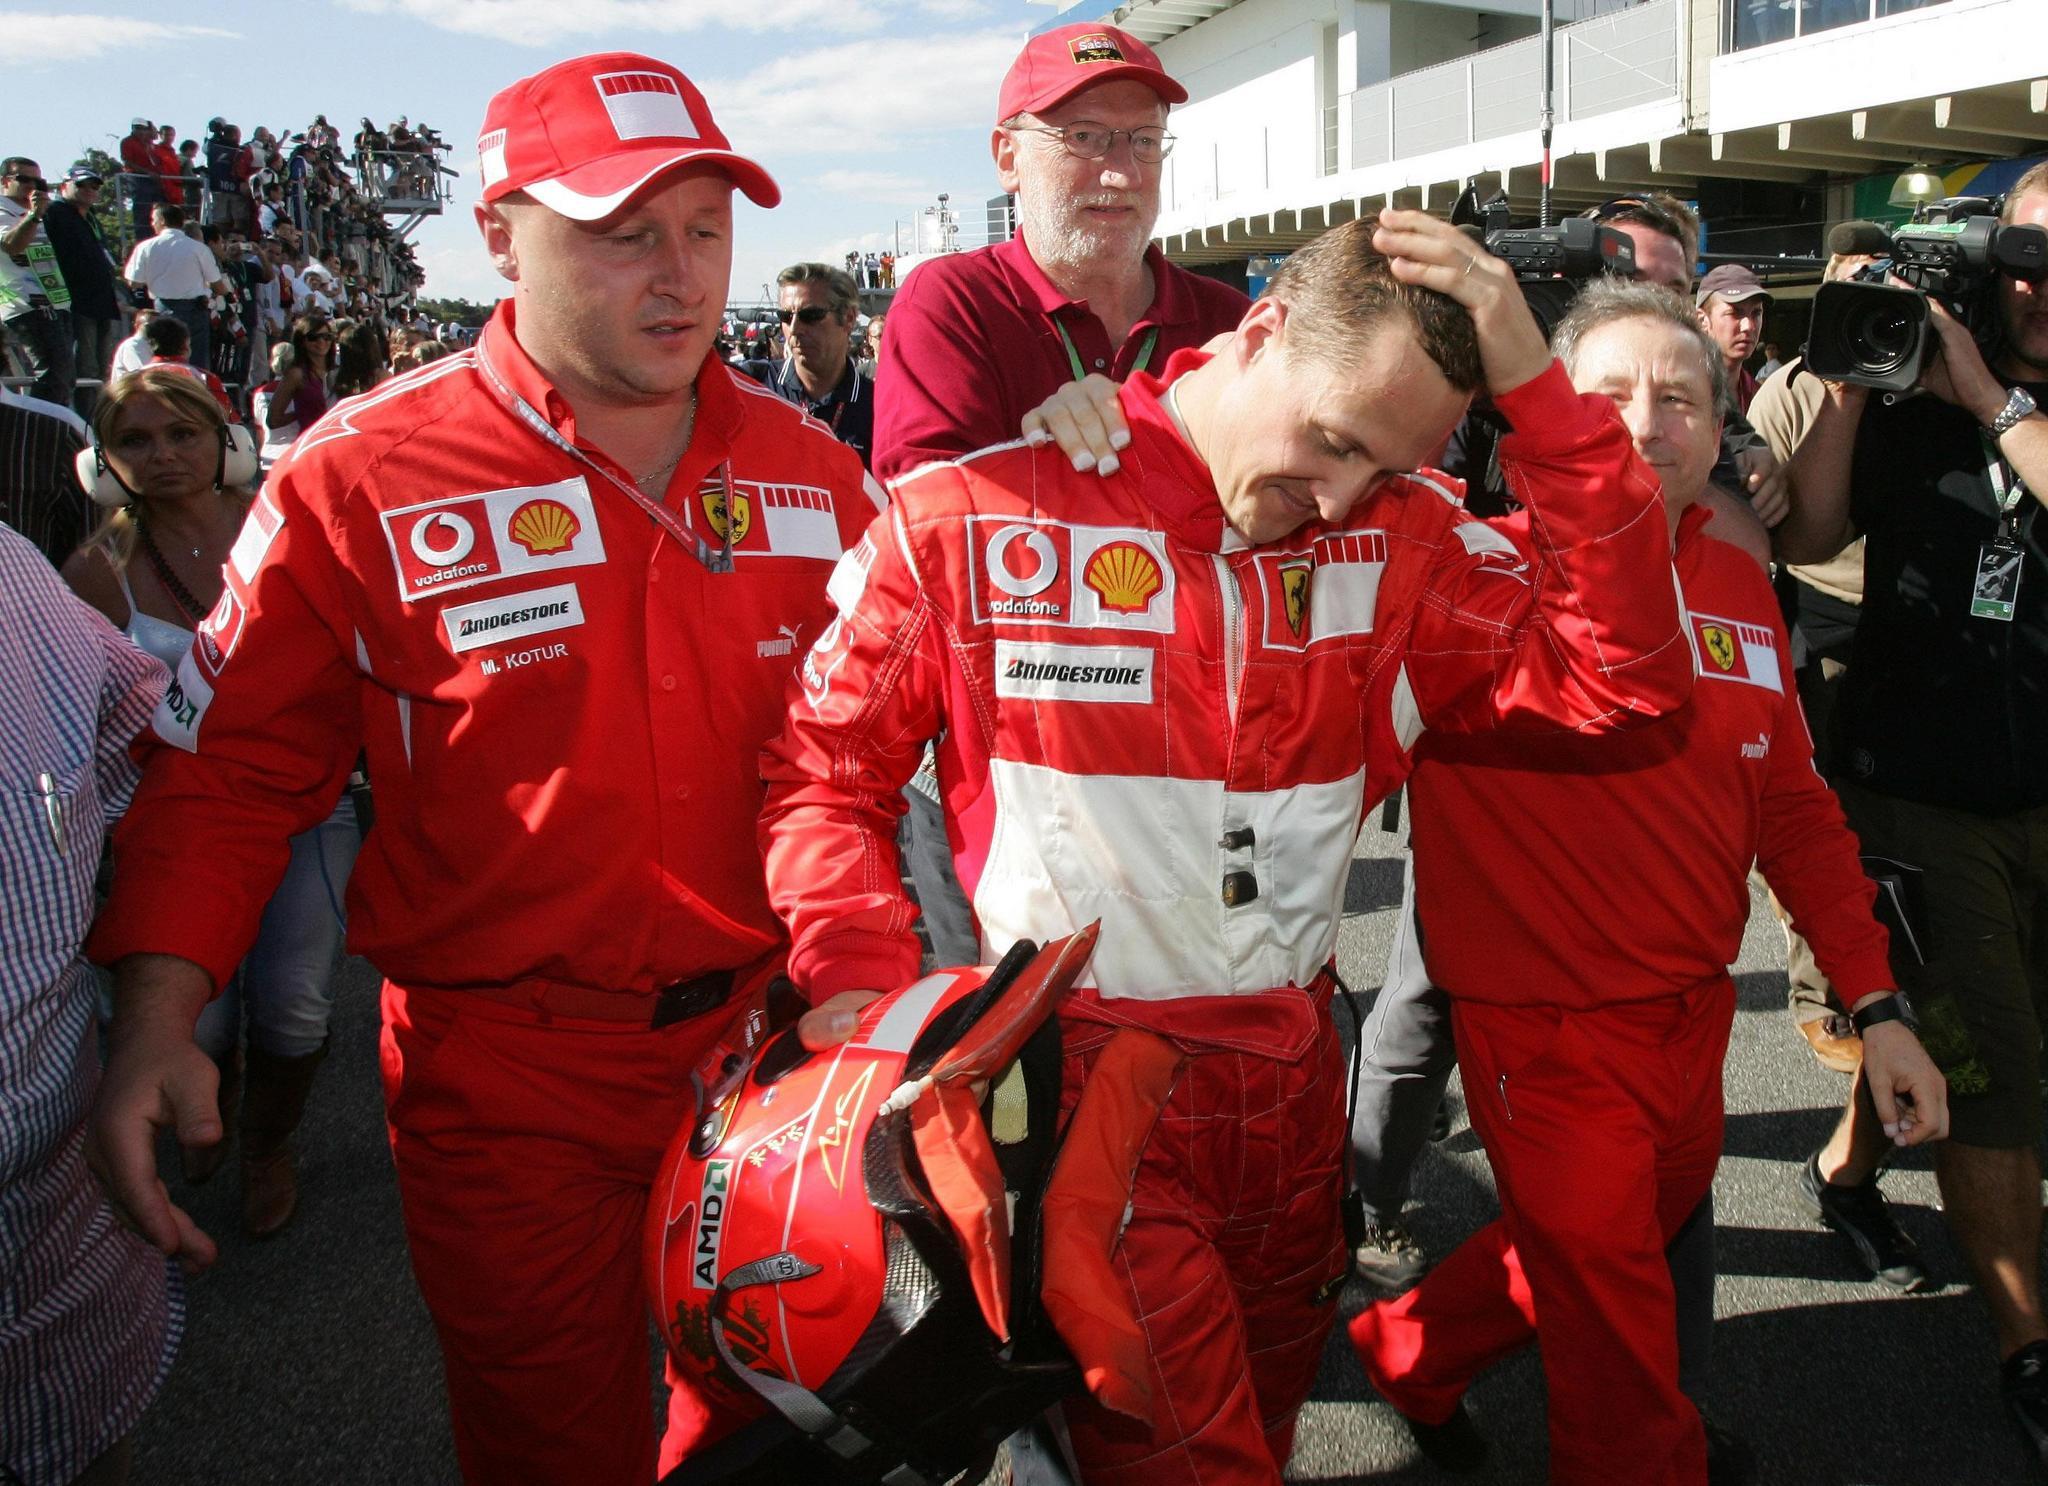 Michael Schumacher walks with Ferrari teammates in the pits